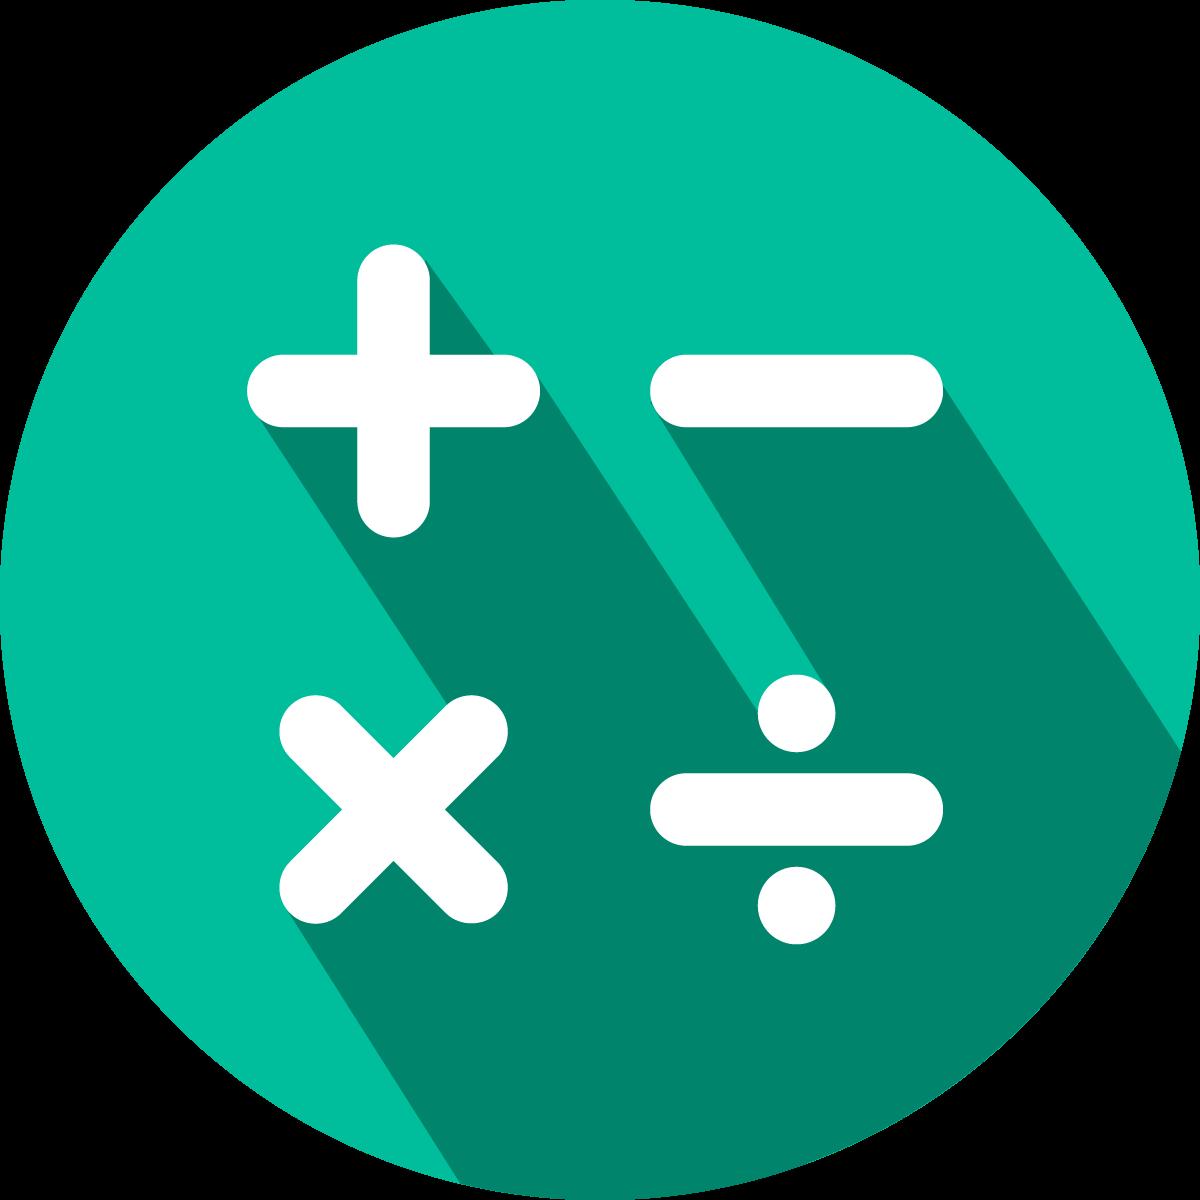 Geometry clipart advanced mathematics. Project ideas math activities